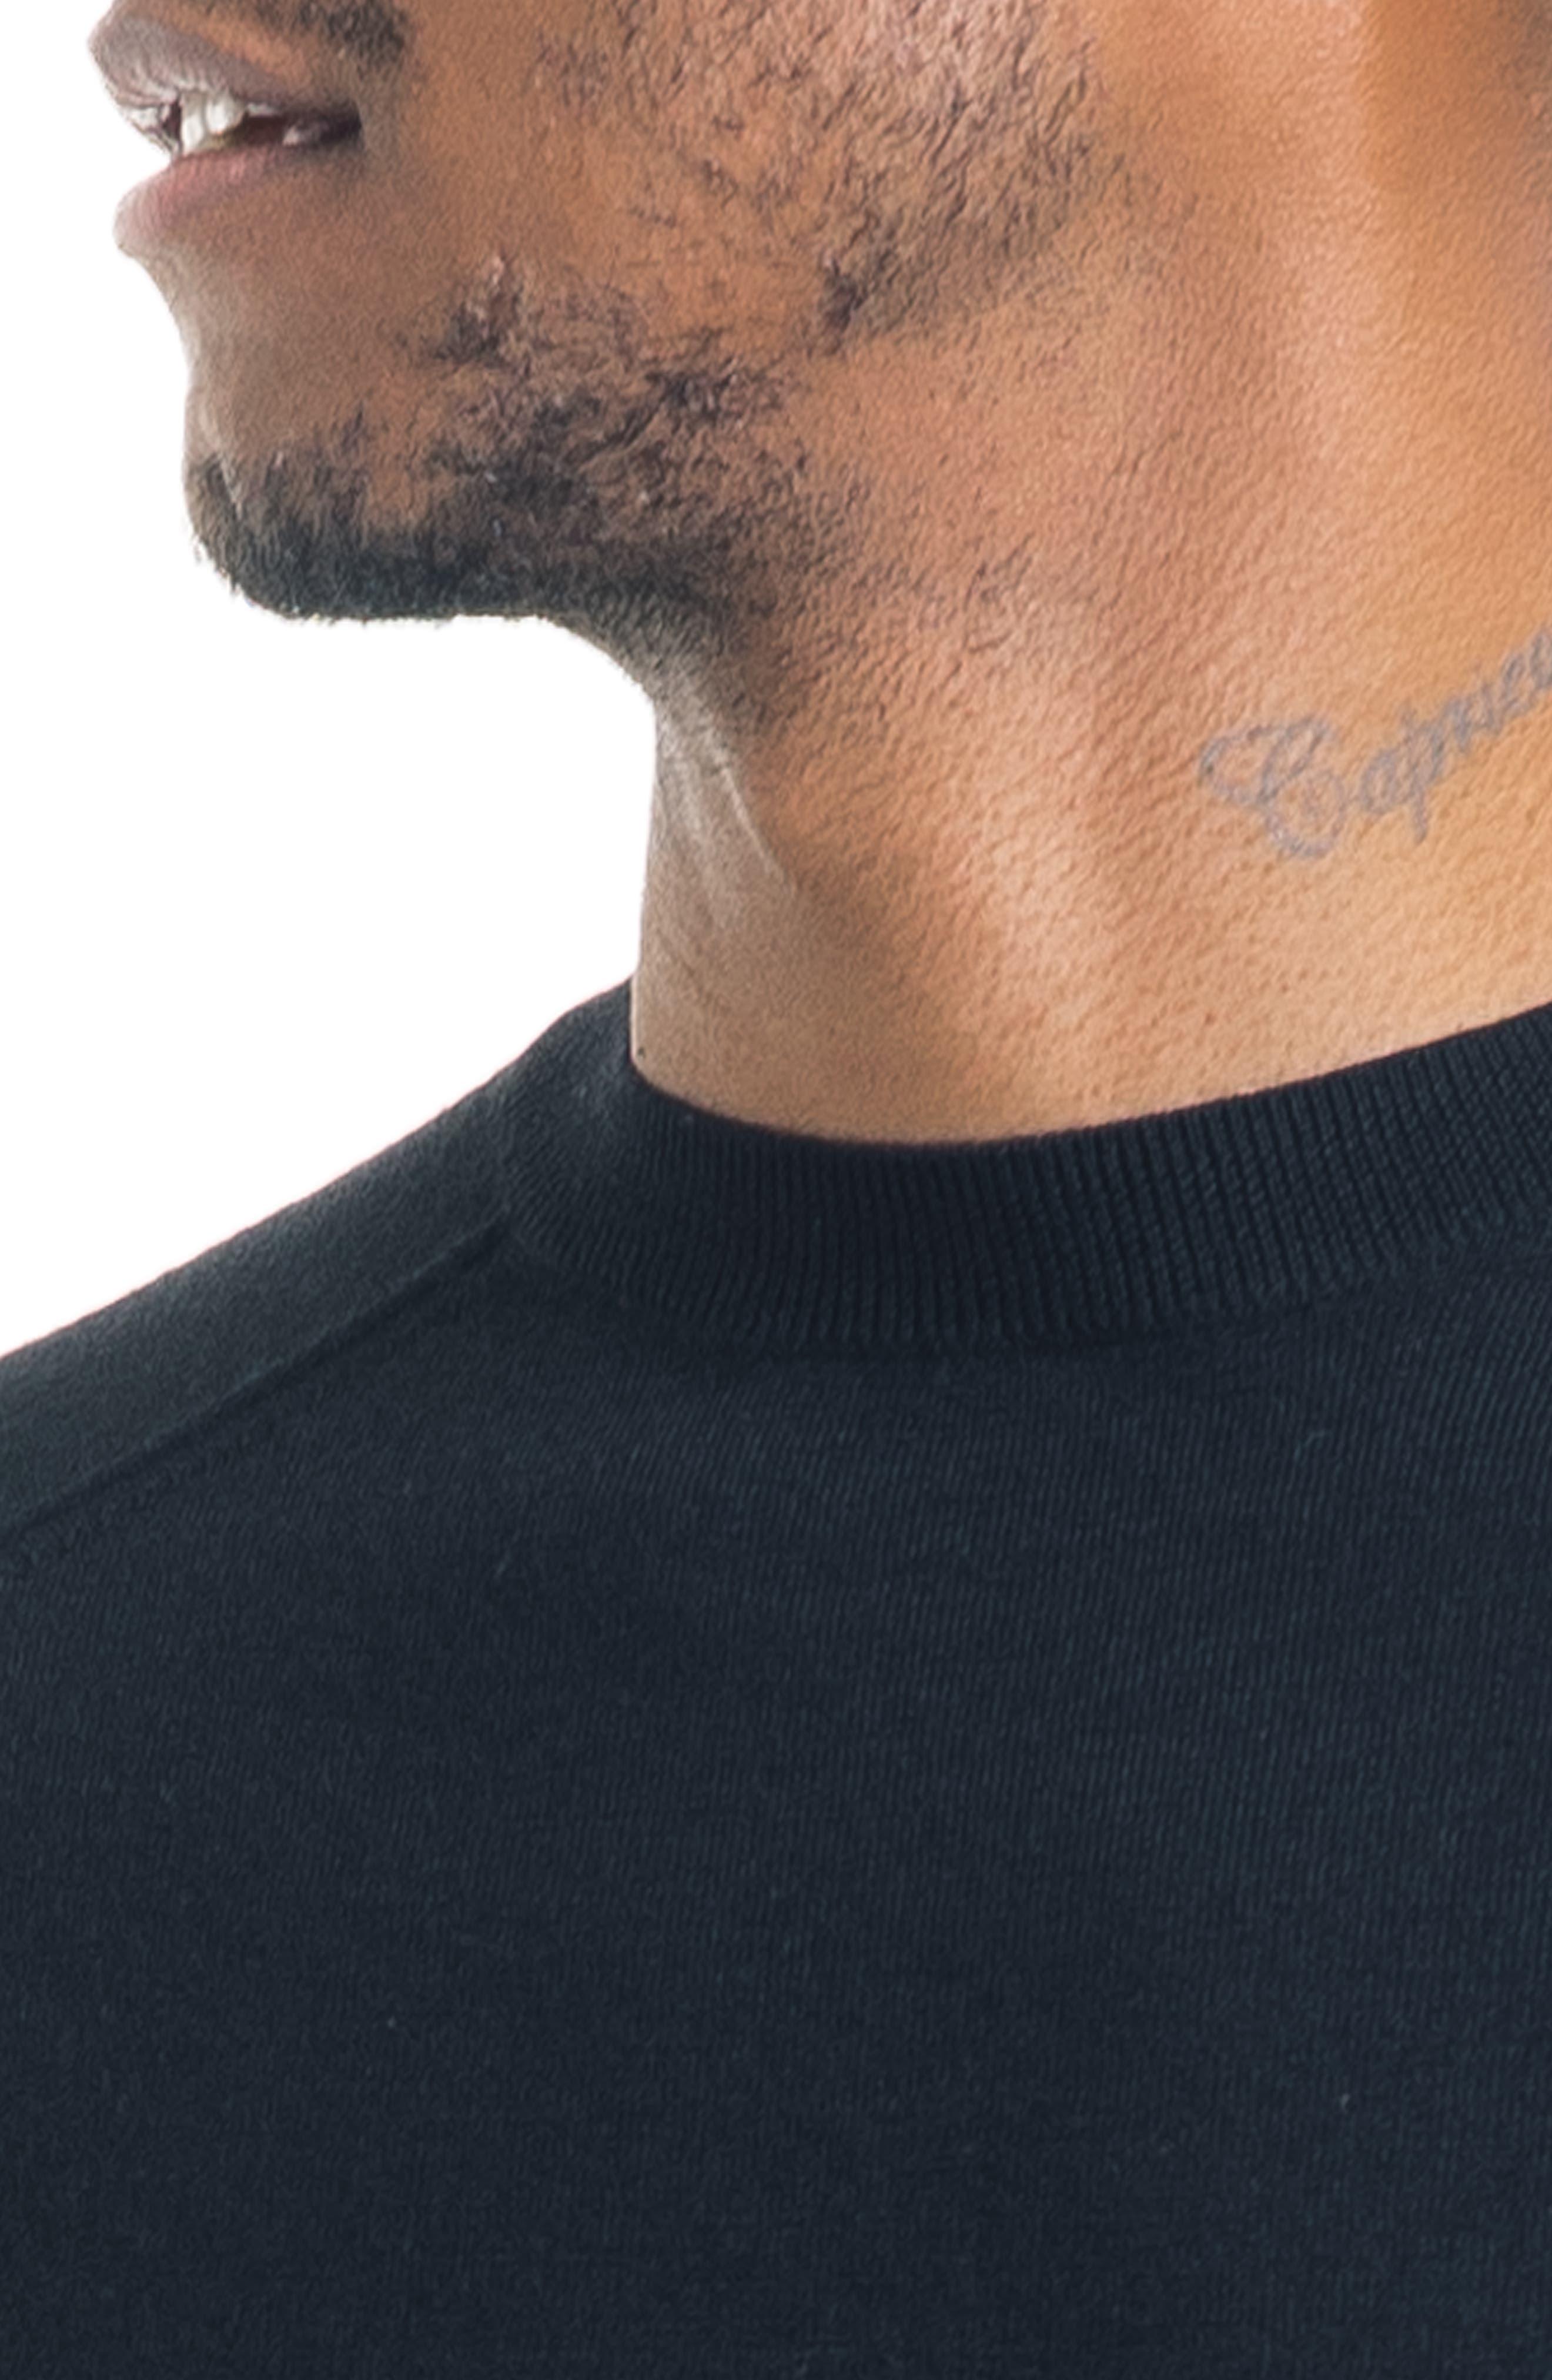 Modern Slim Fit Merino Wool Sweater,                             Alternate thumbnail 4, color,                             BLACK